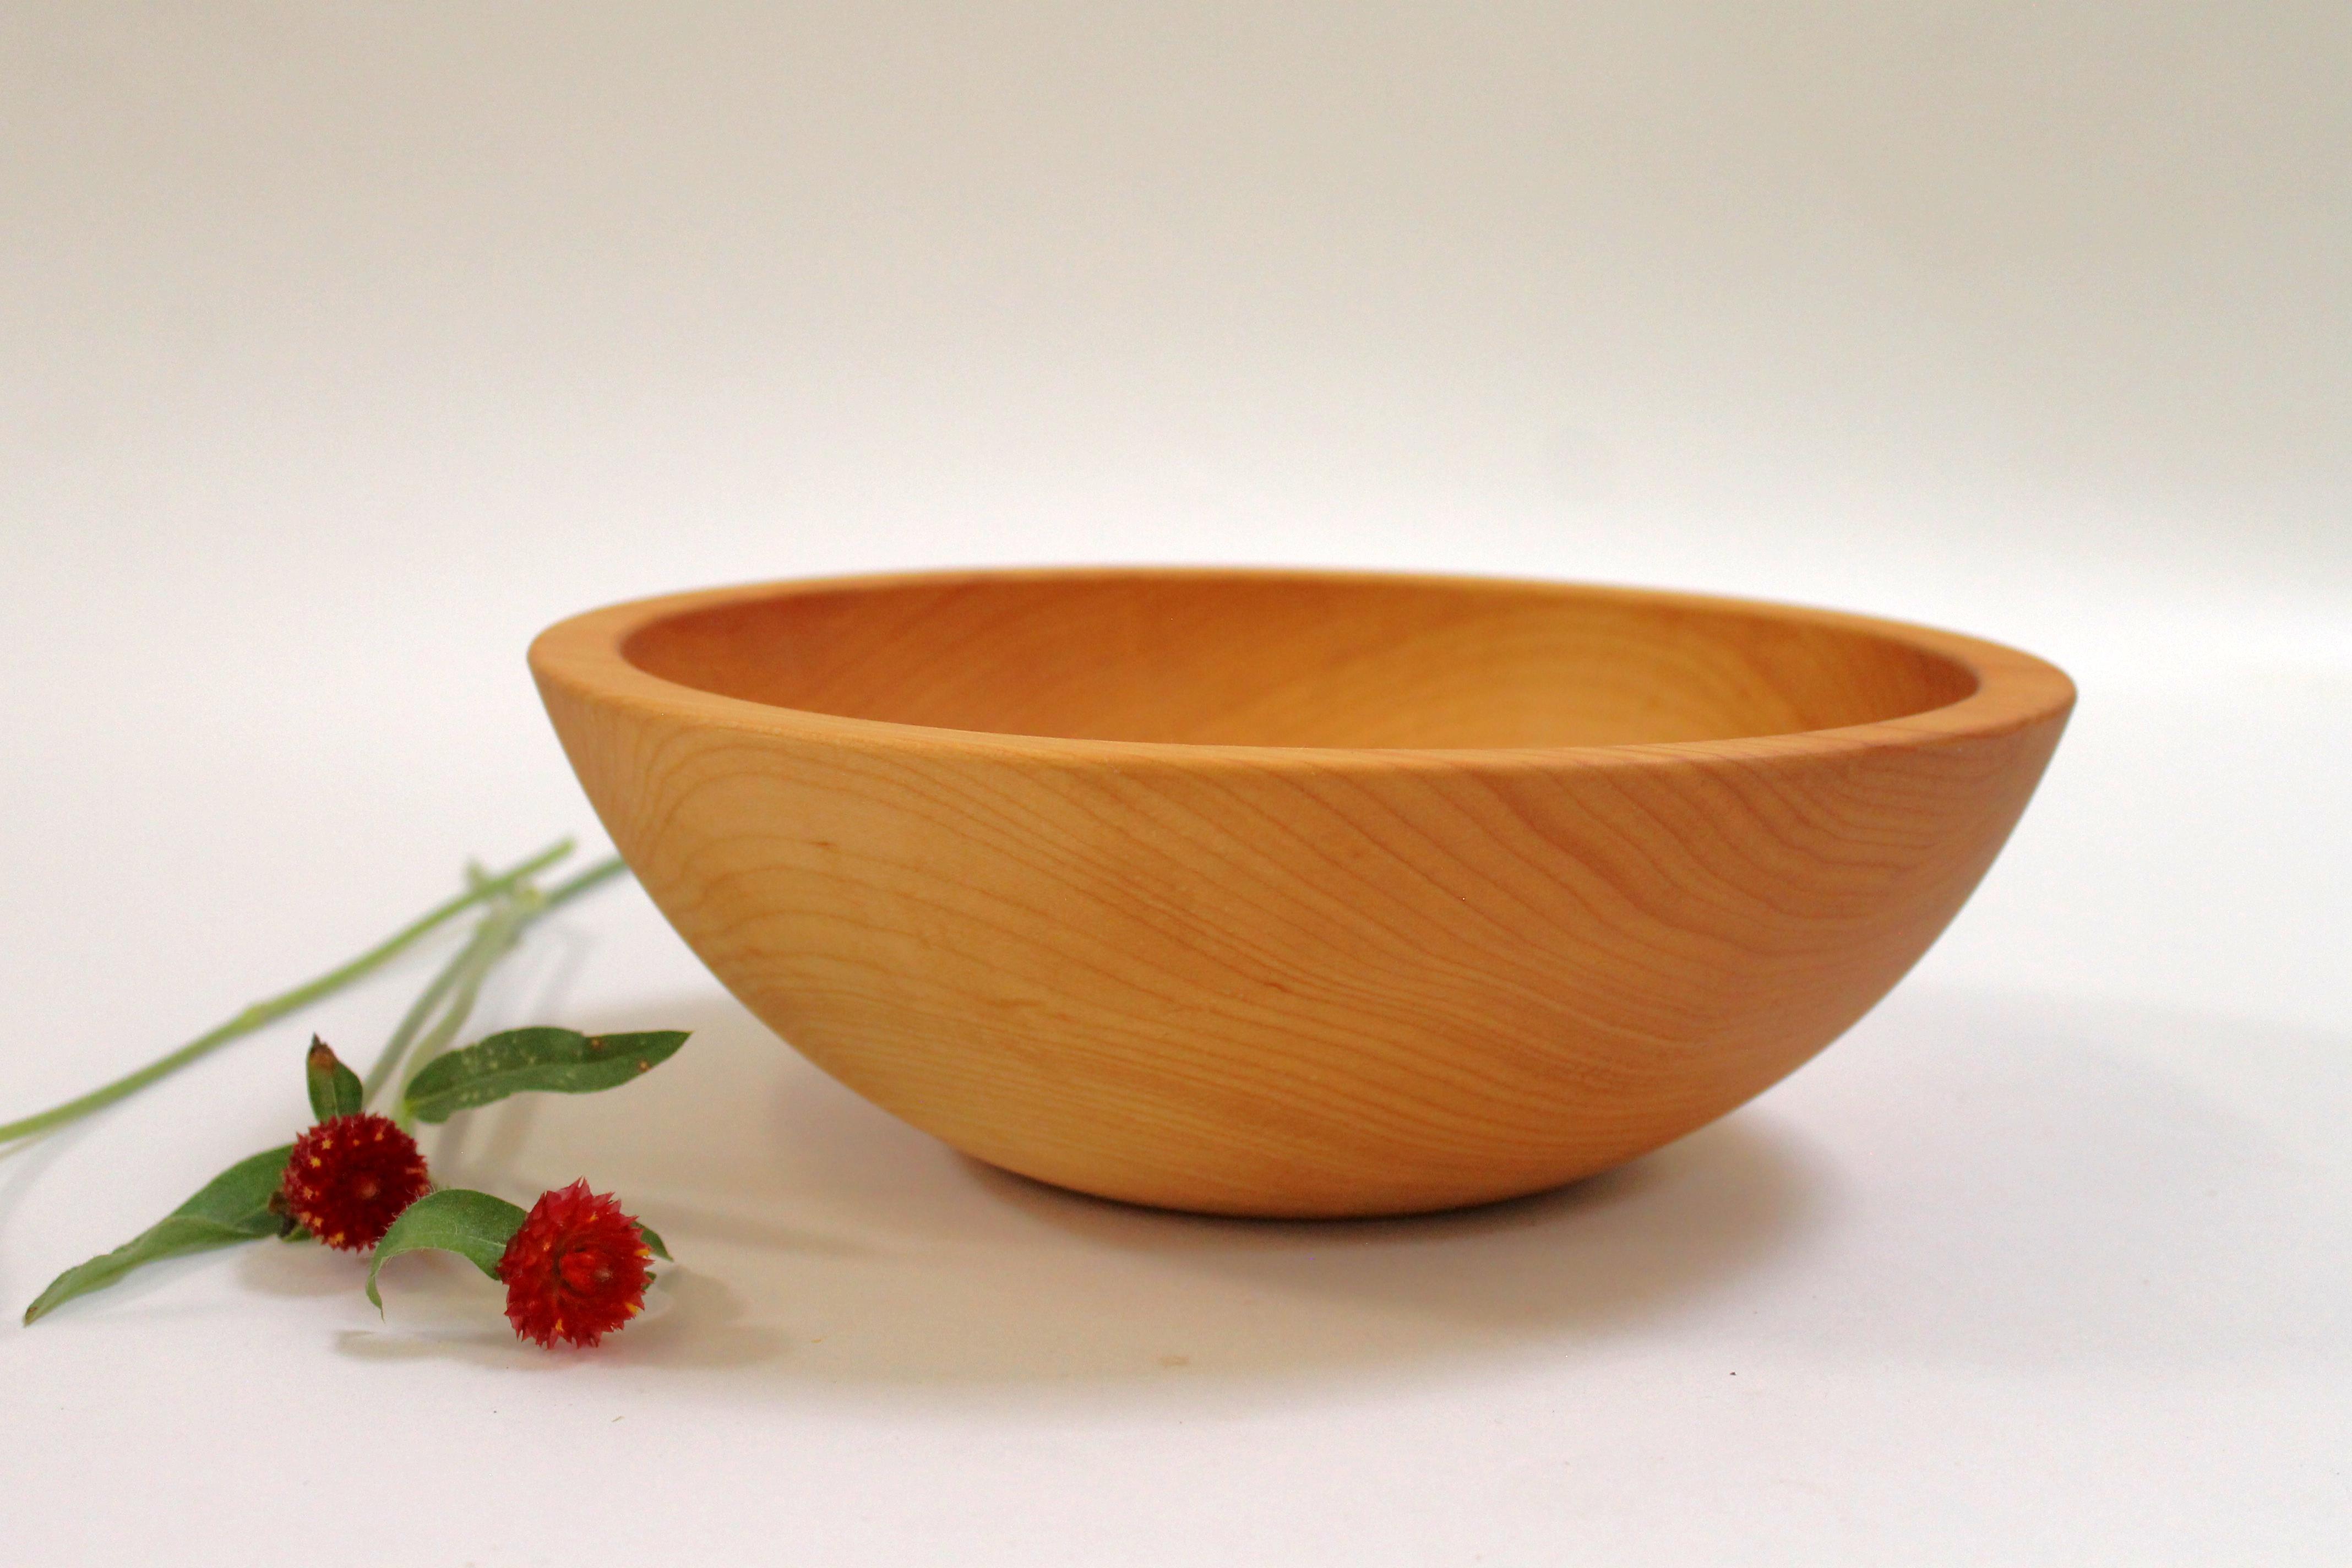 10 inch Hard Maple Bowl - Bee's Oil Finish M110B